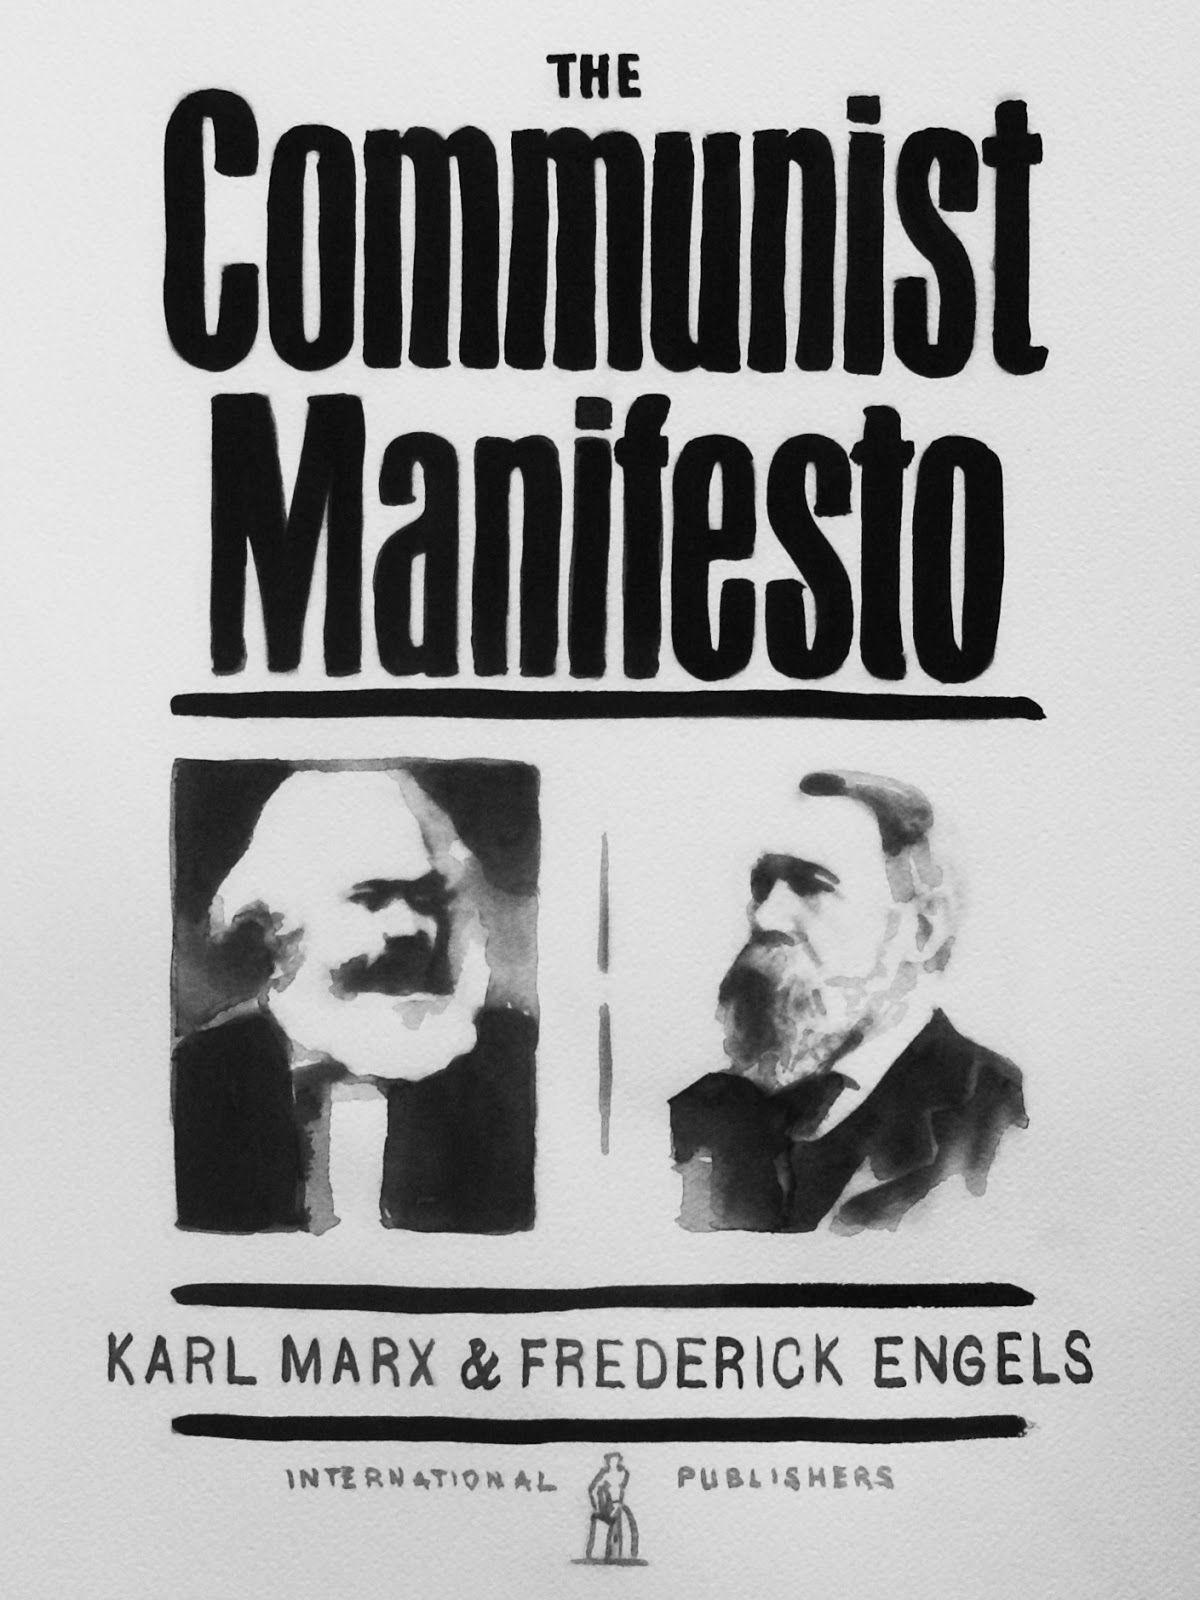 COMMUNIST MANIFESTO KARL MARX EPUB DOWNLOAD